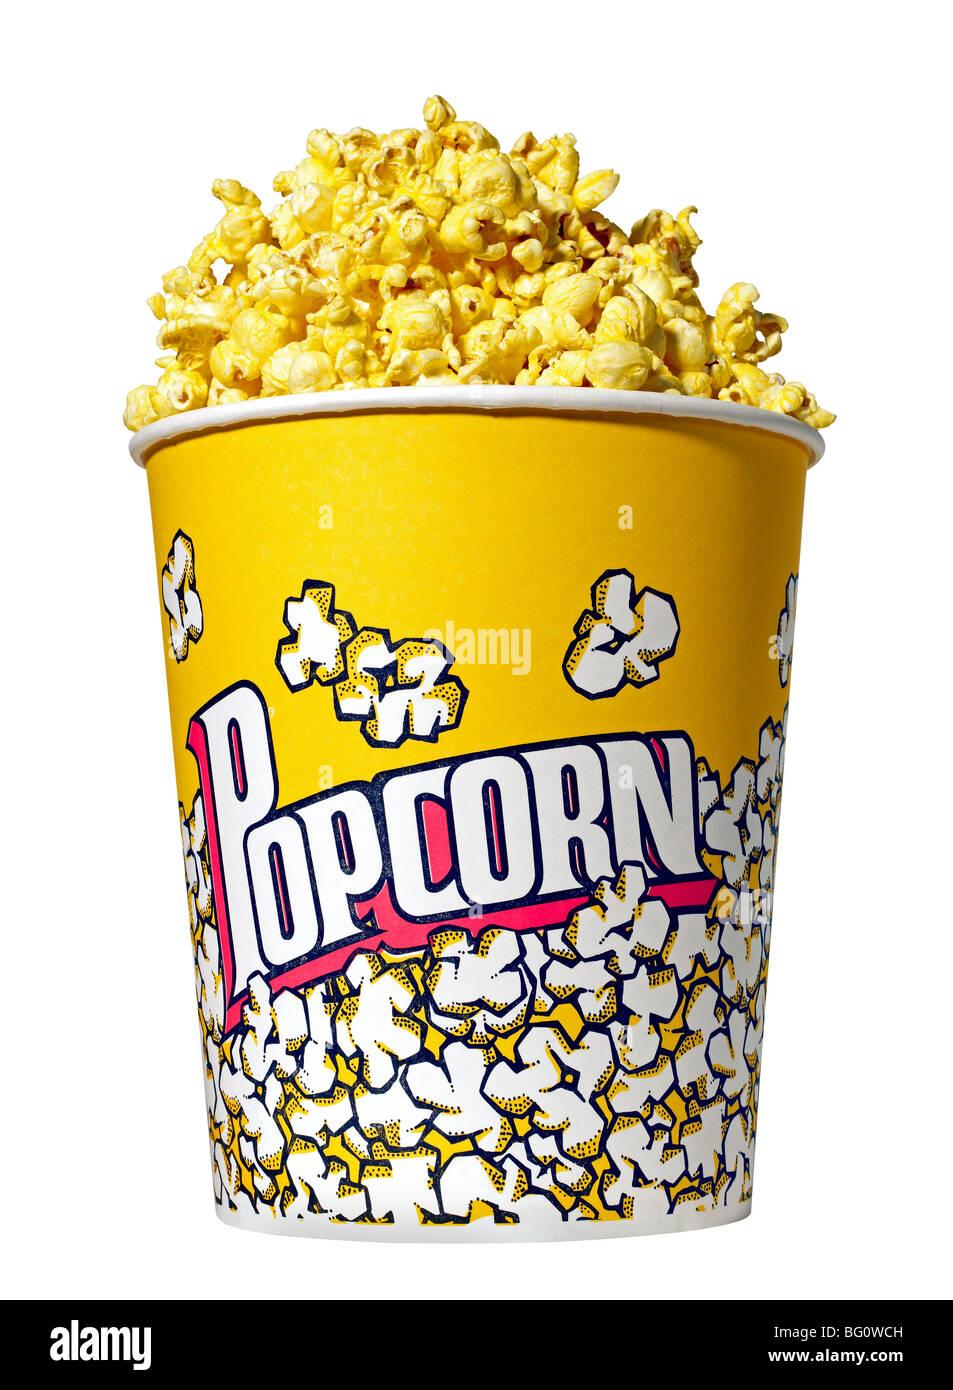 Bucket of Popcorn - Stock Image